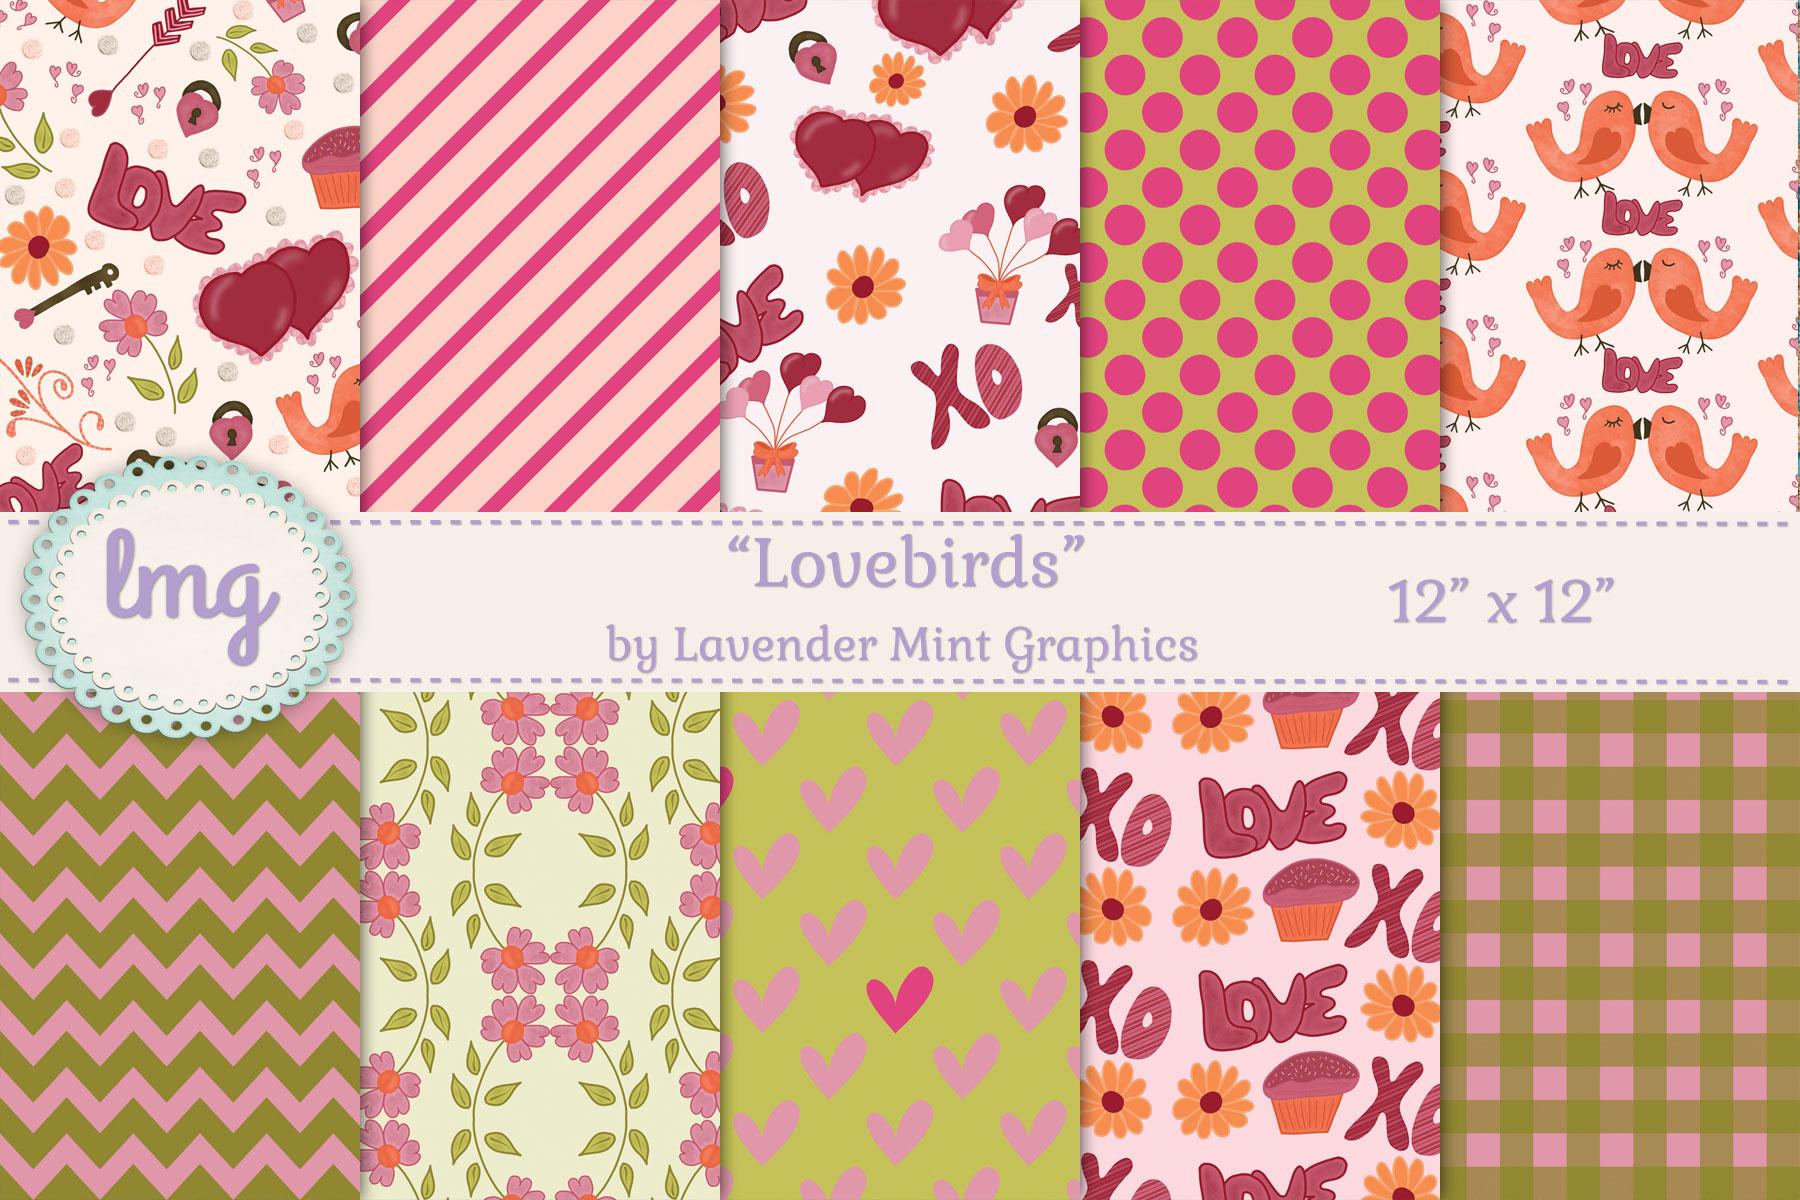 Lovebirds Valentines Day Digital Scrapbook Paper example image 1